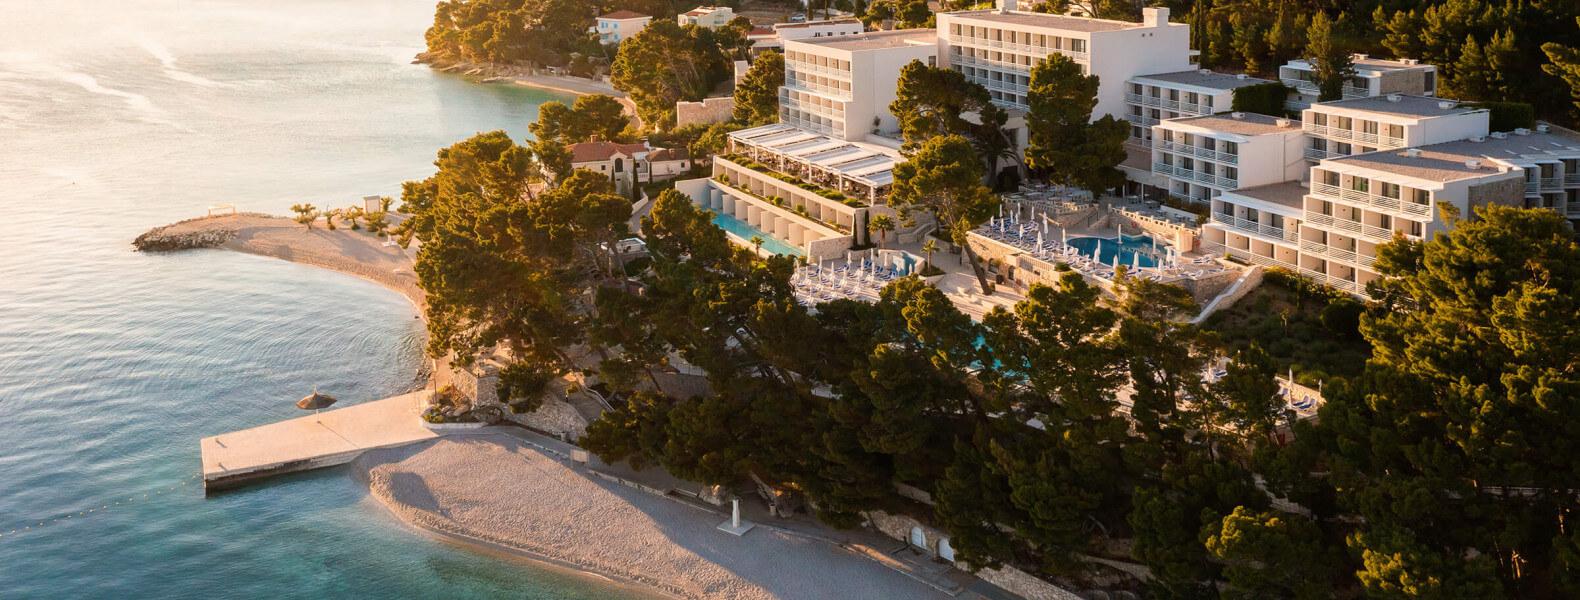 Bluesun hotel Berulia